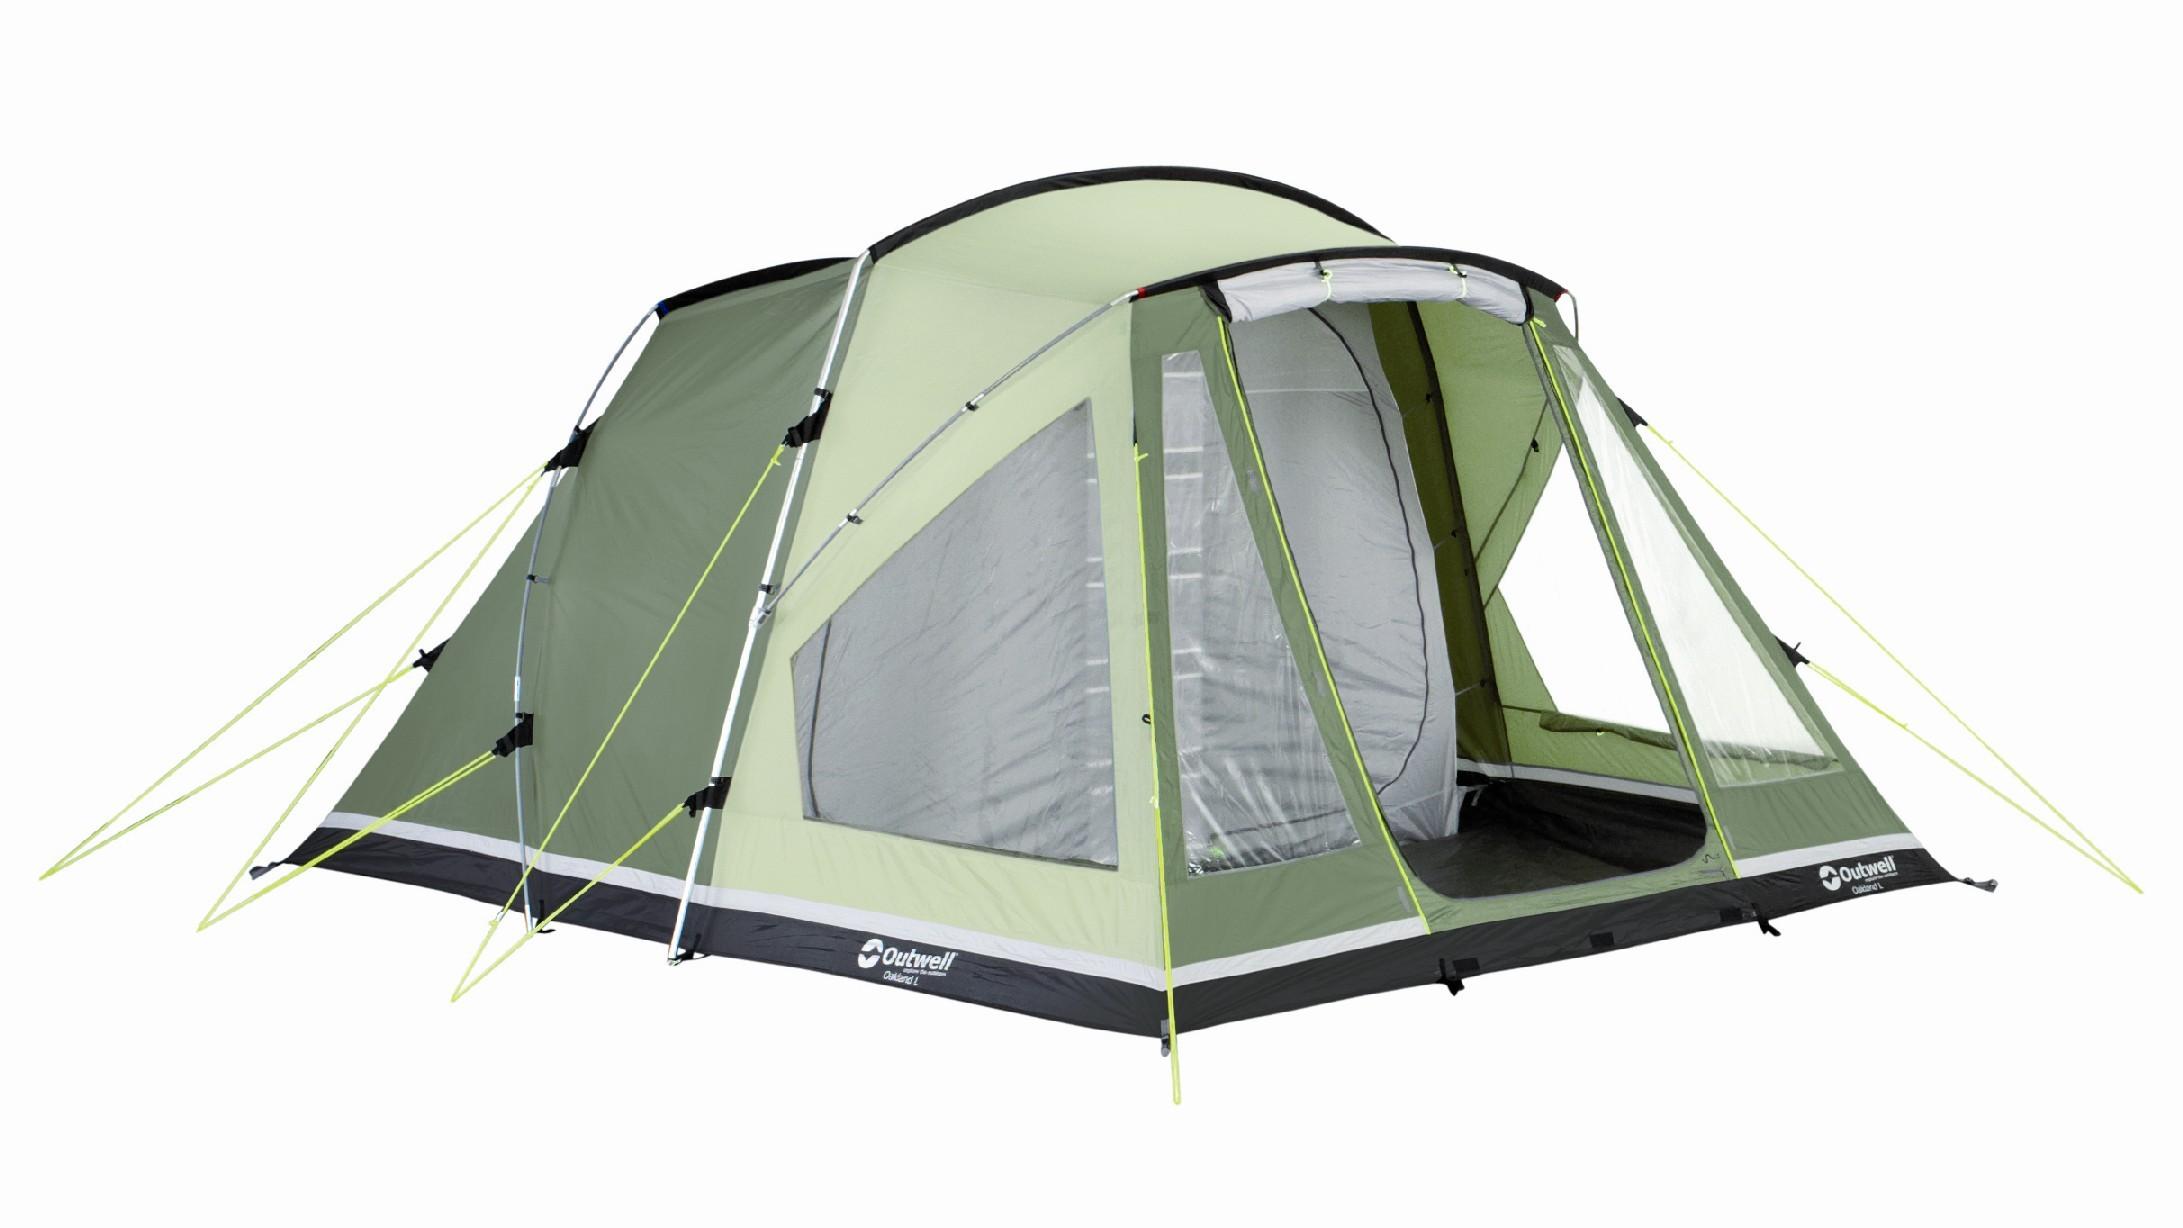 sc 1 st  Outdoor Megastore & Outwell Oakland L Tent